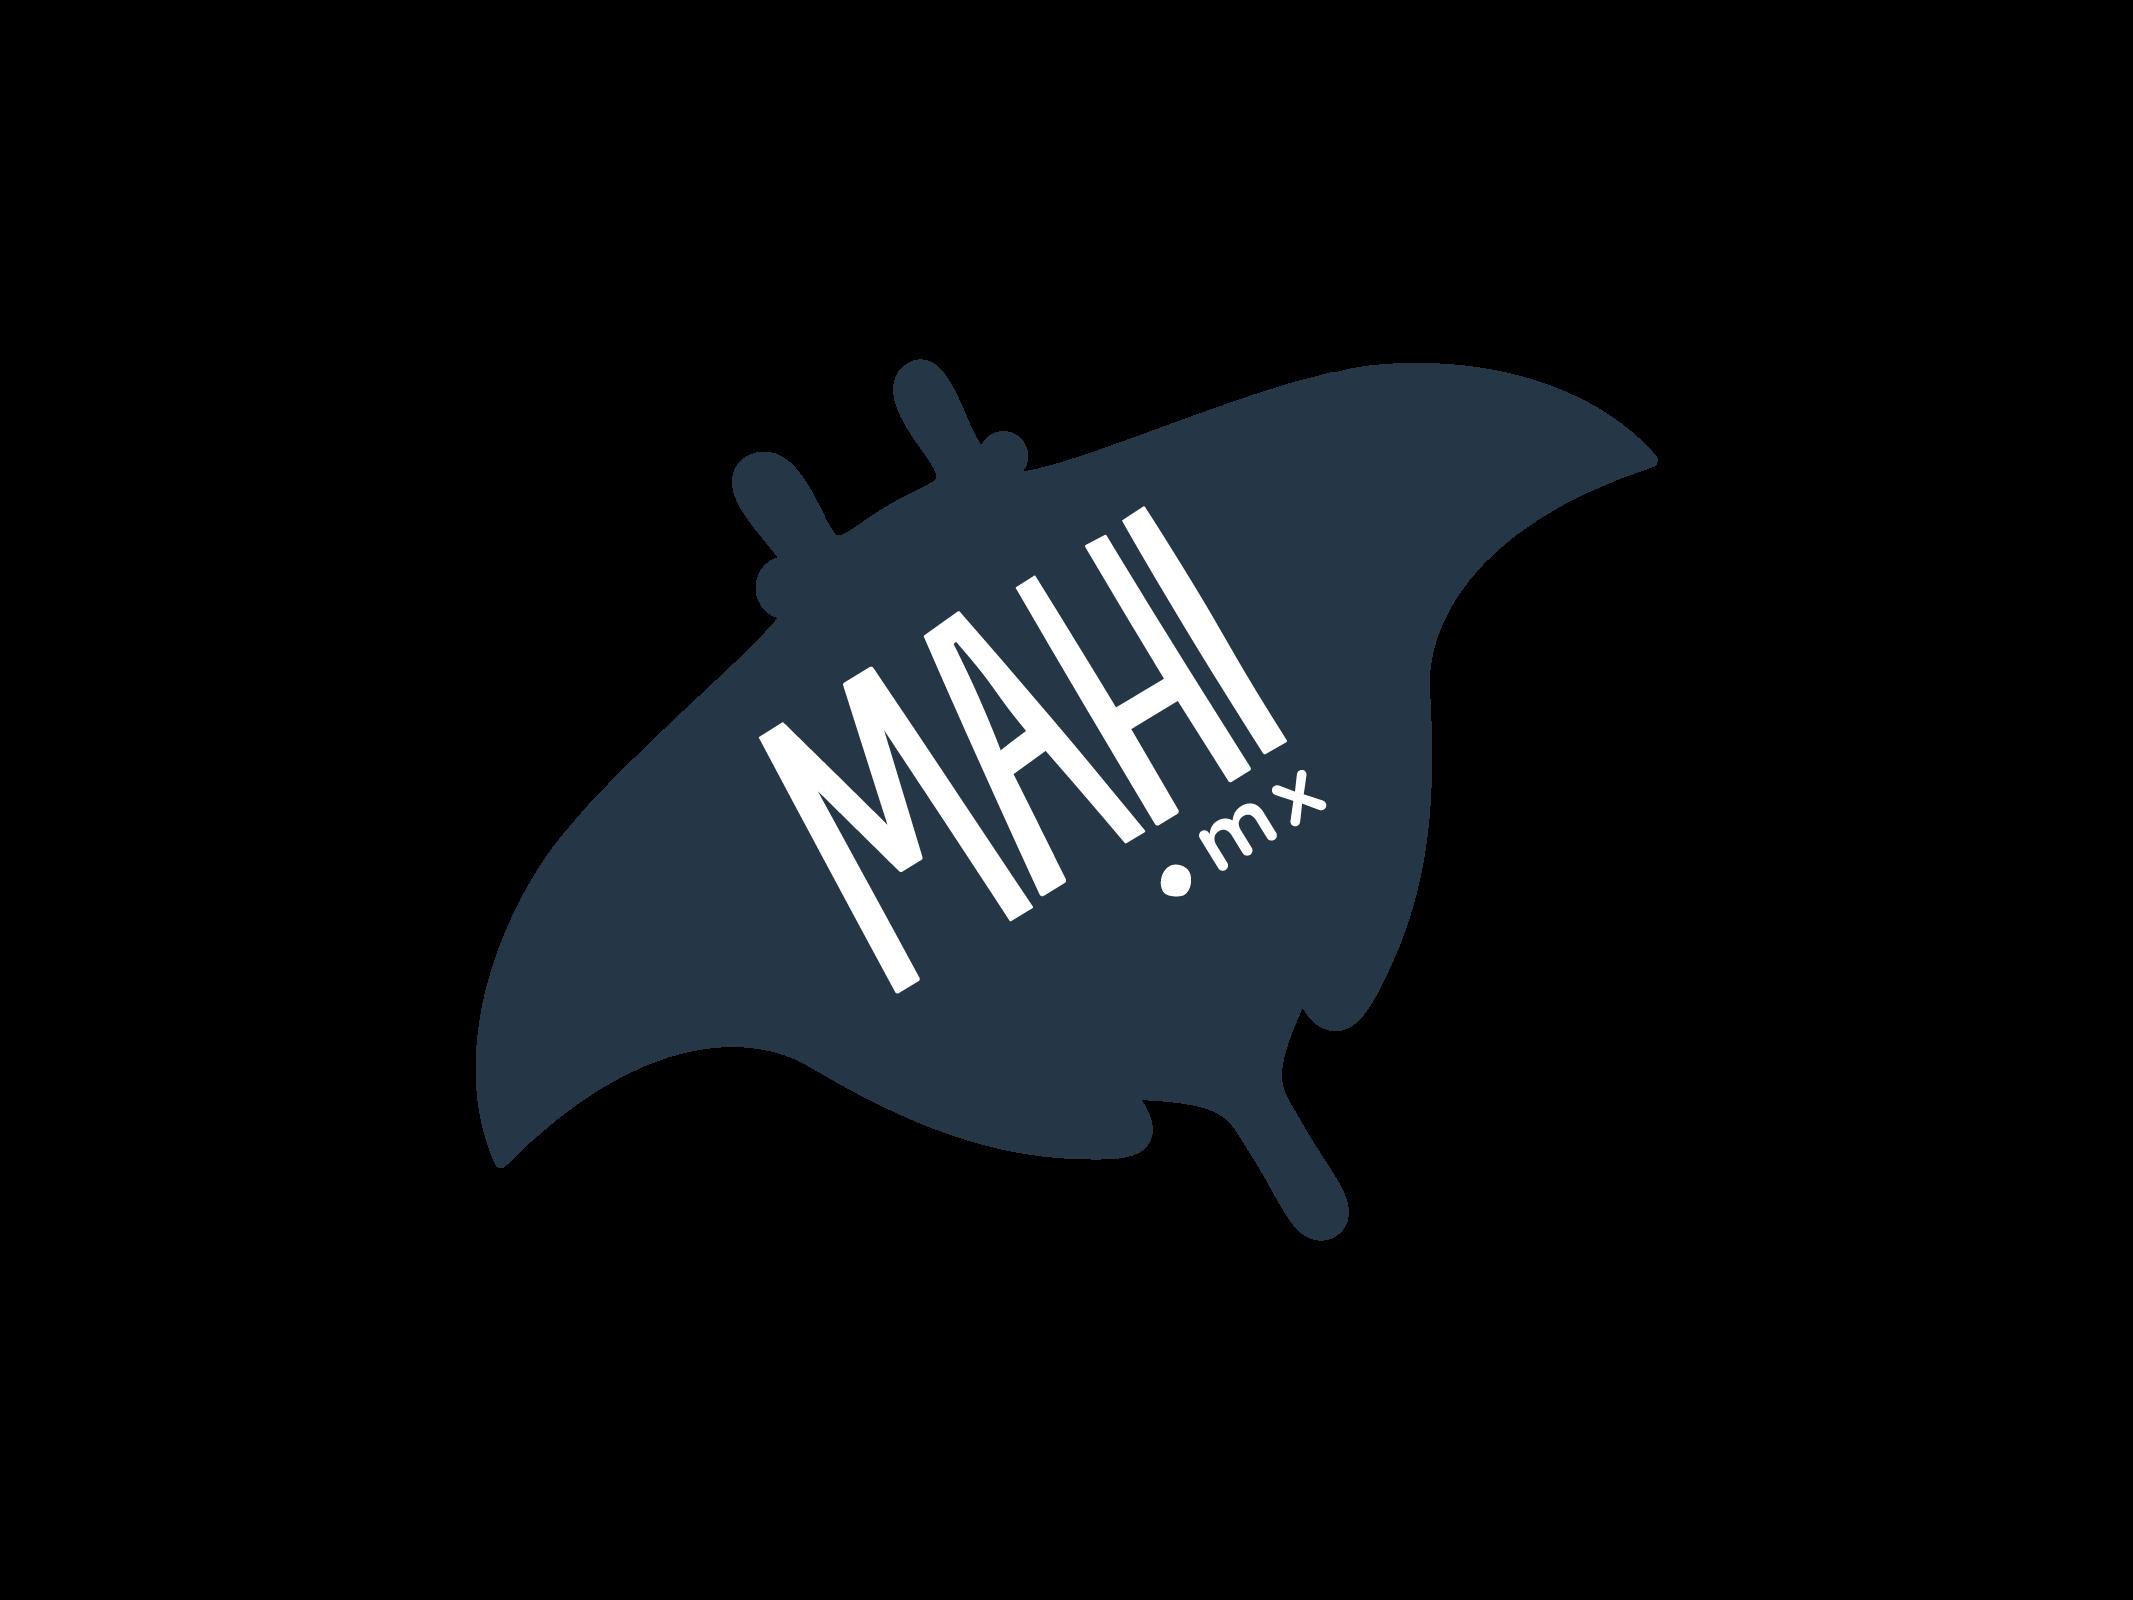 Logos - Mahi_isotipo_logotipo_dominio